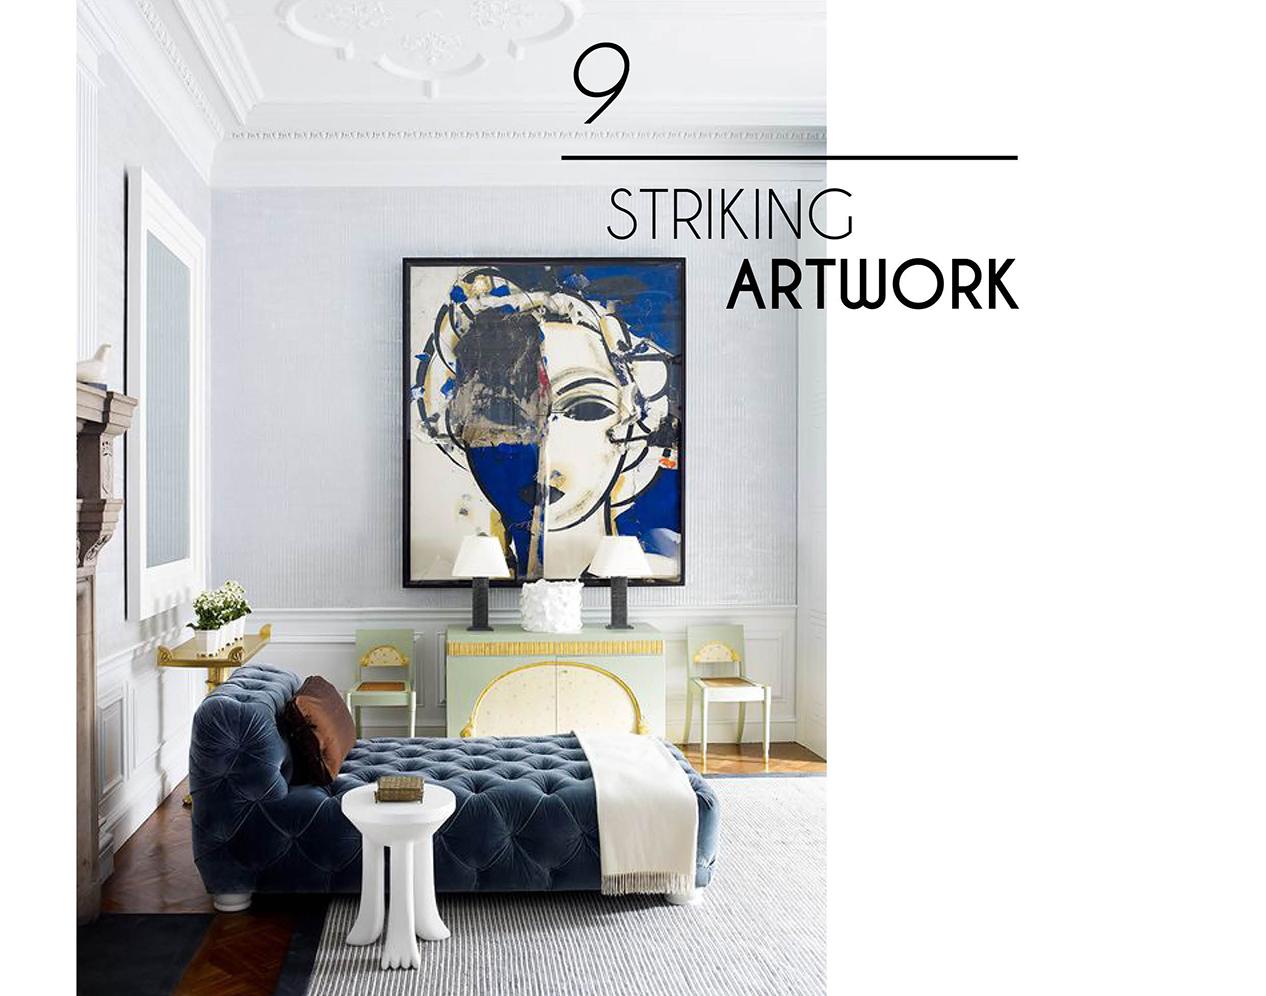 chic interior style artwork